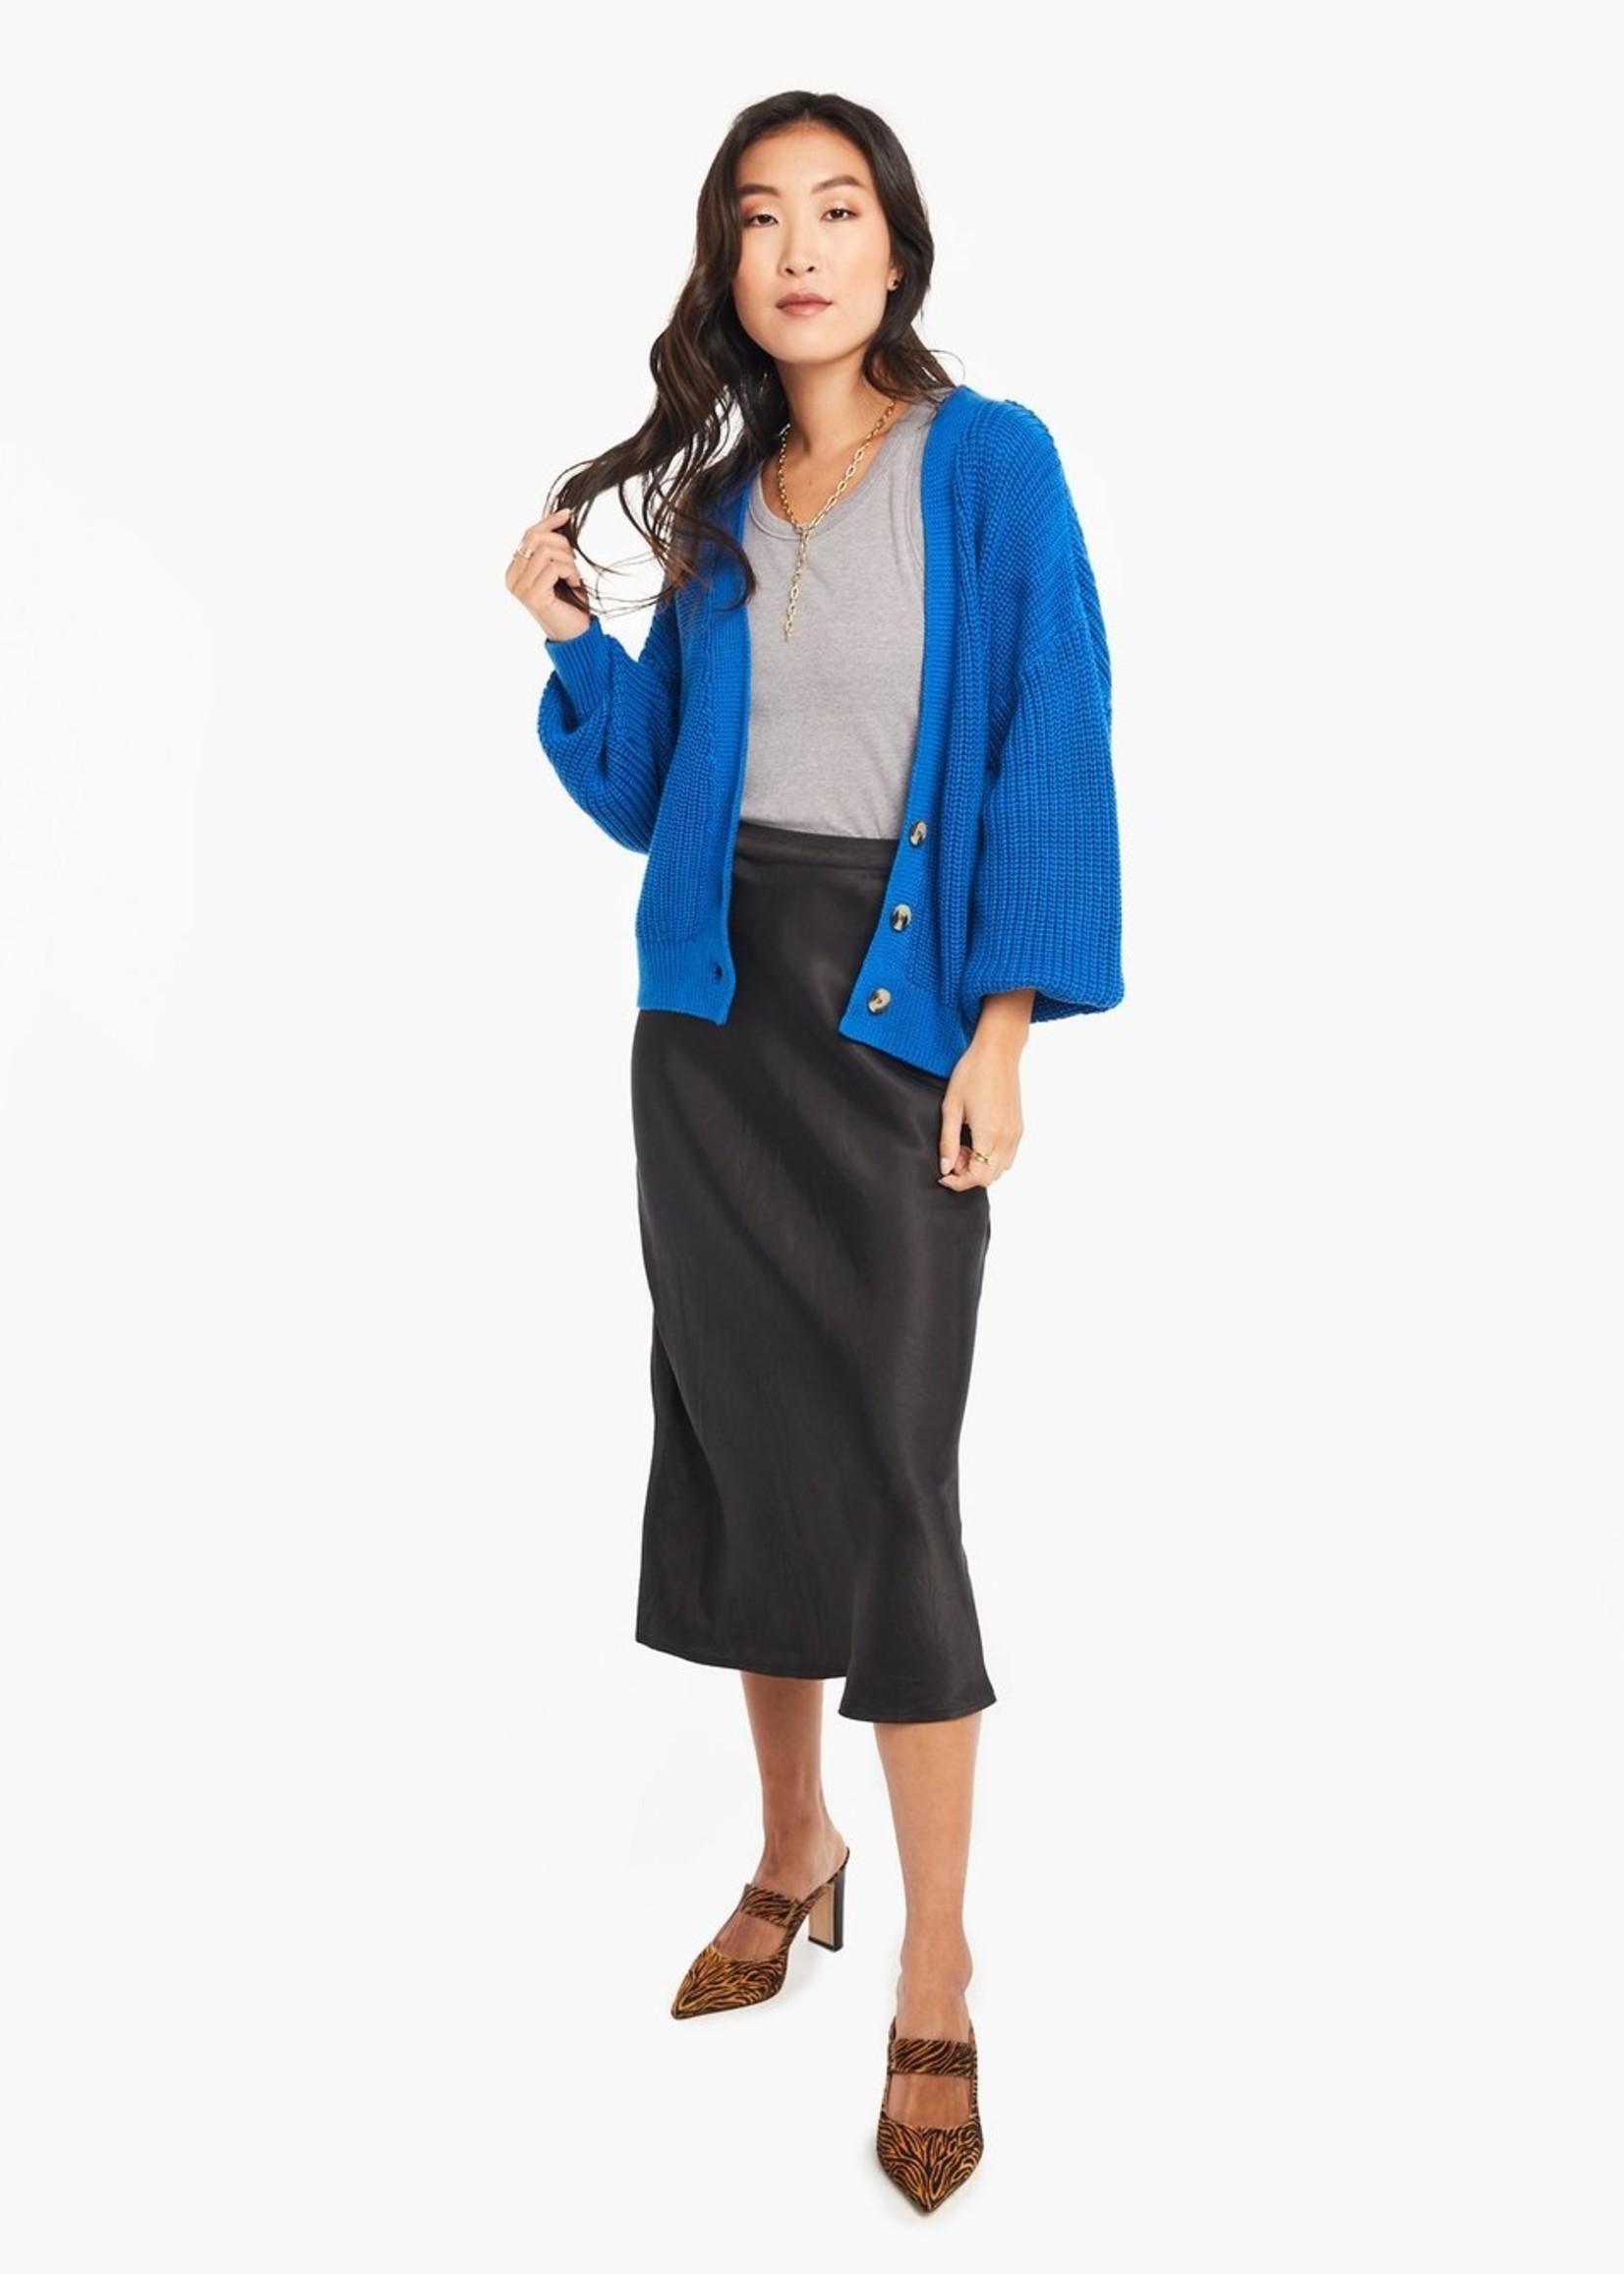 Elitaire Boutique Rene Black Midi Skirt